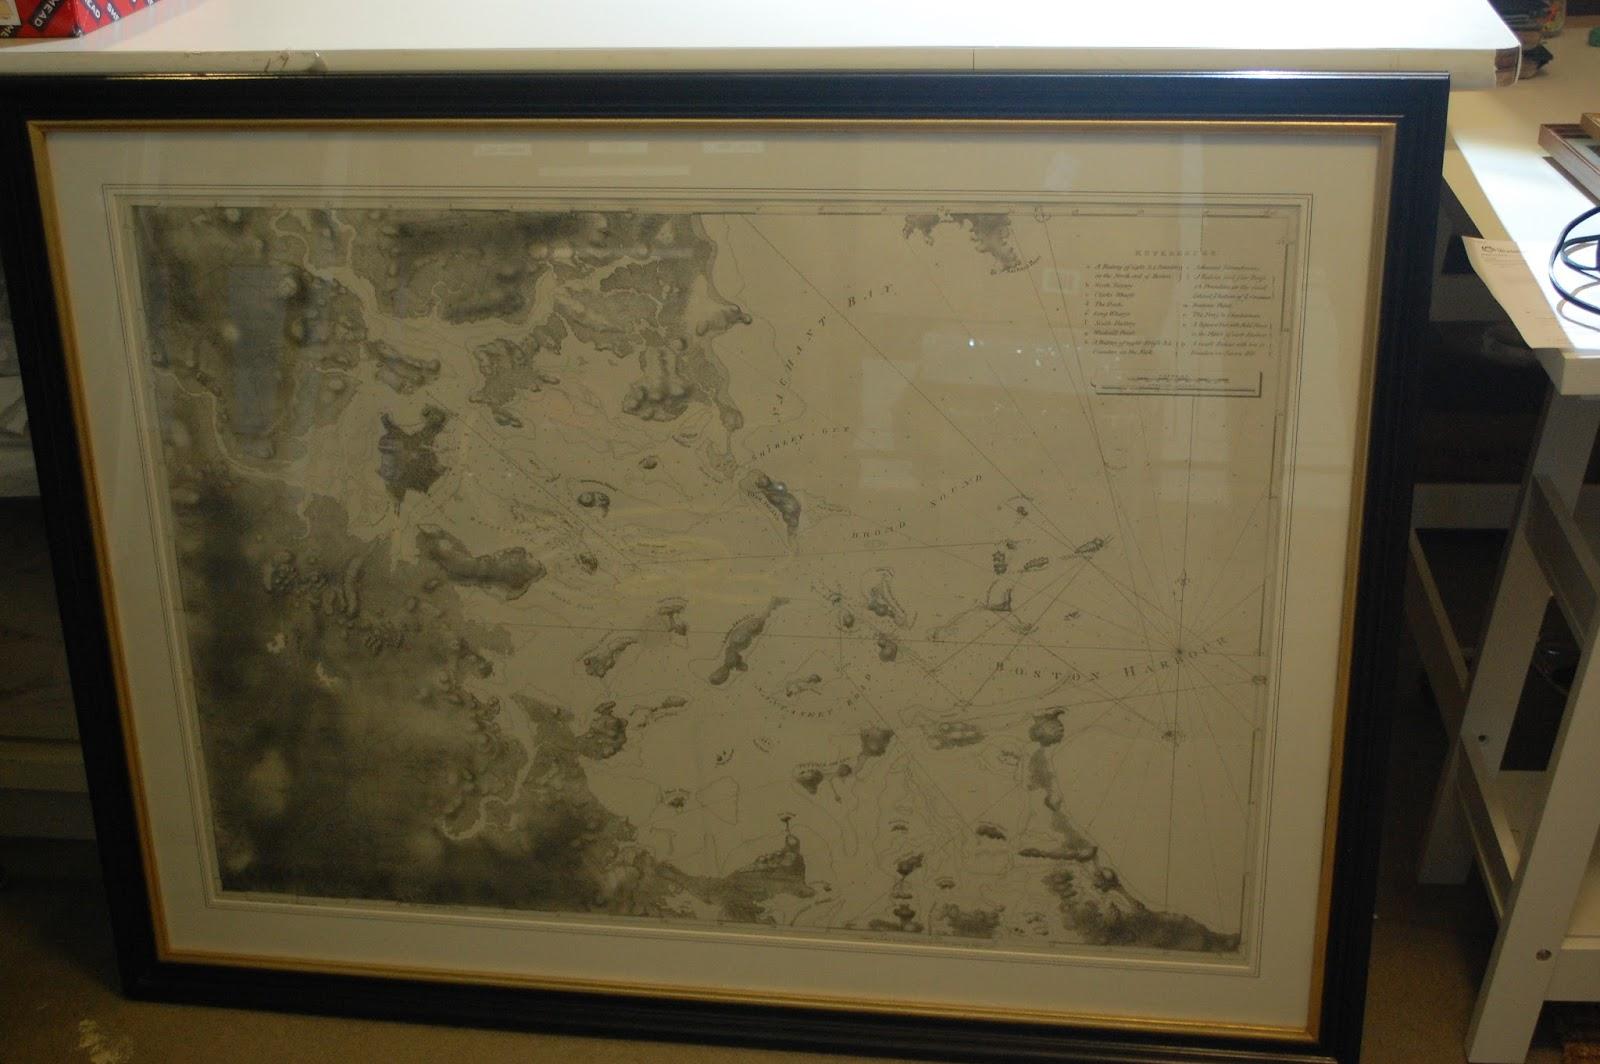 A Chart of Boston Bay.  Gift of Peter Kastner, 2016.0001.001